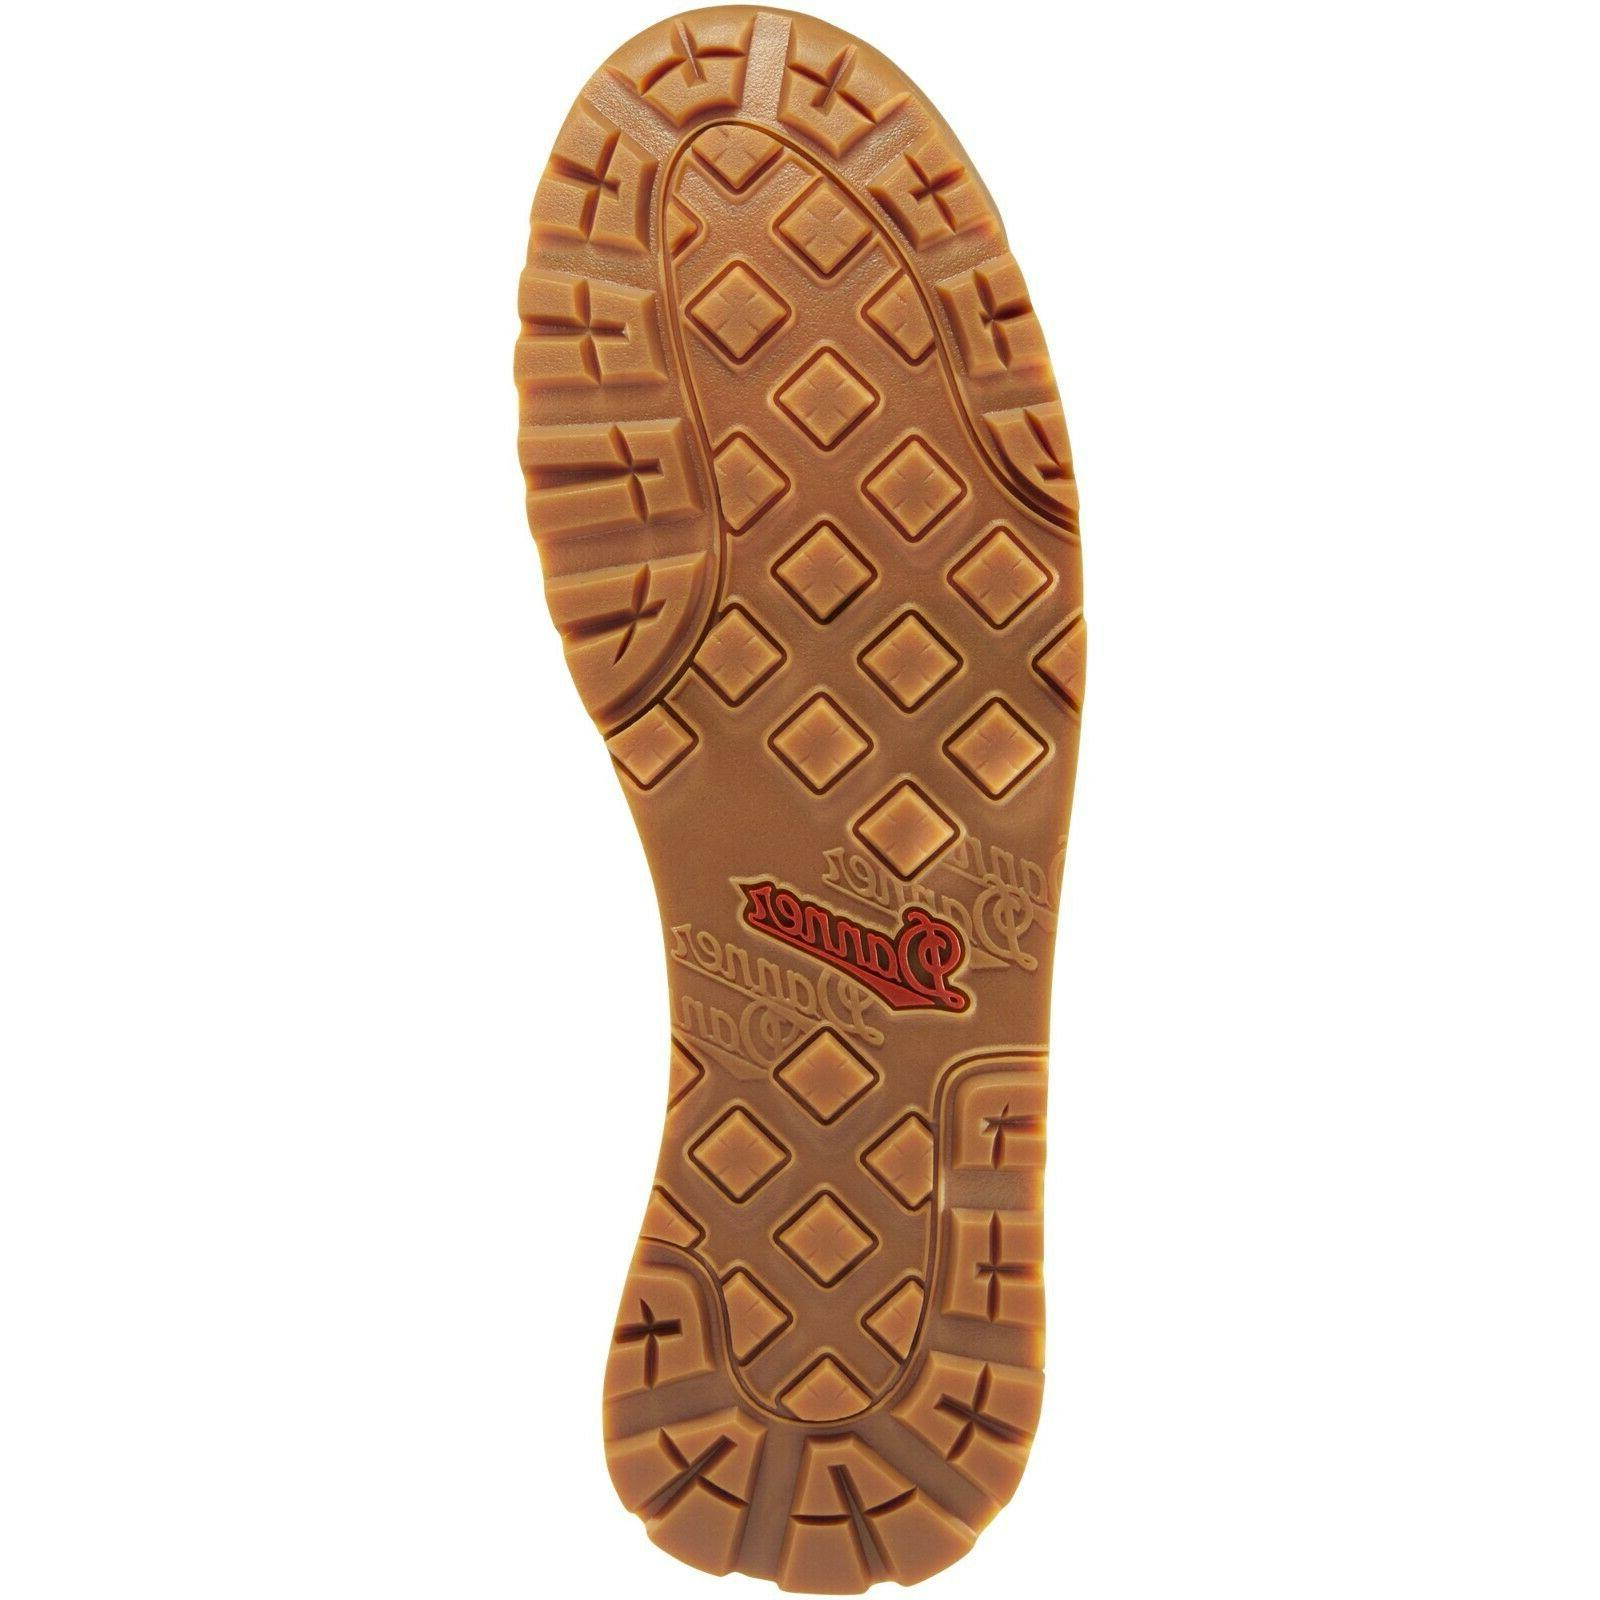 Danner Hiking Boots - Monk's Thrush